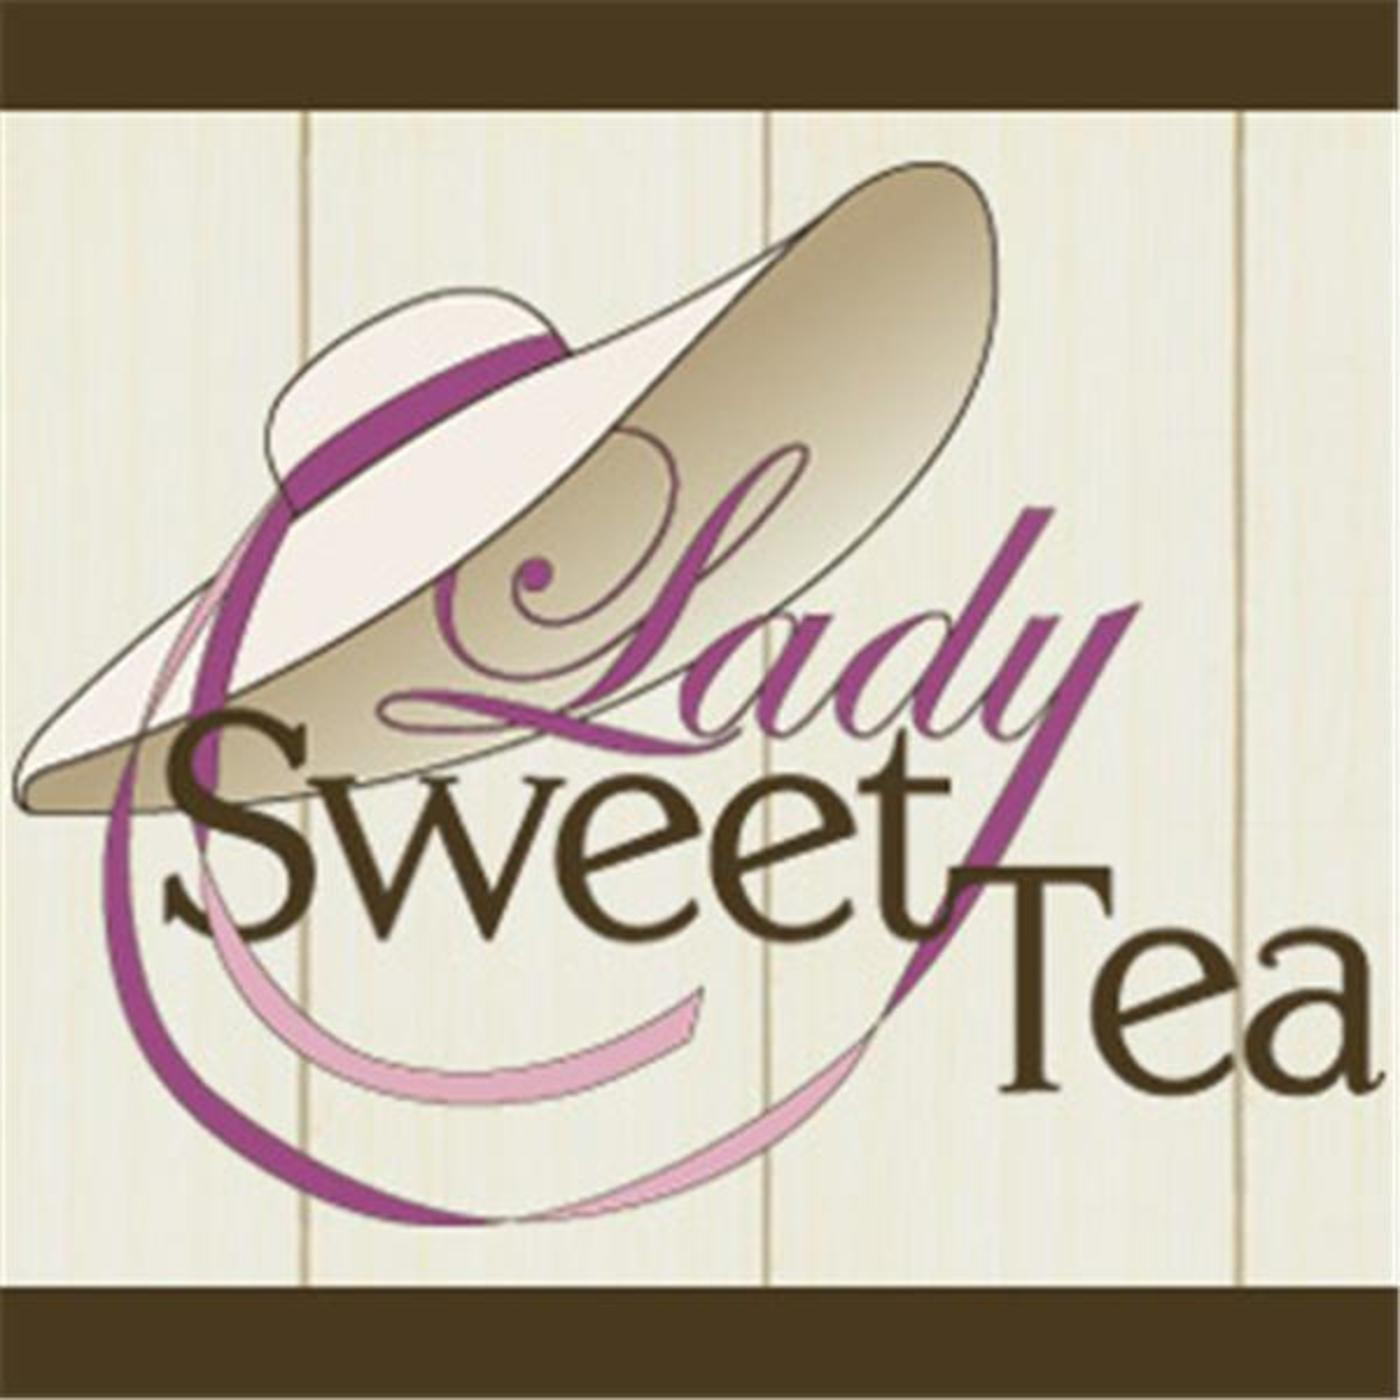 ladysweettea